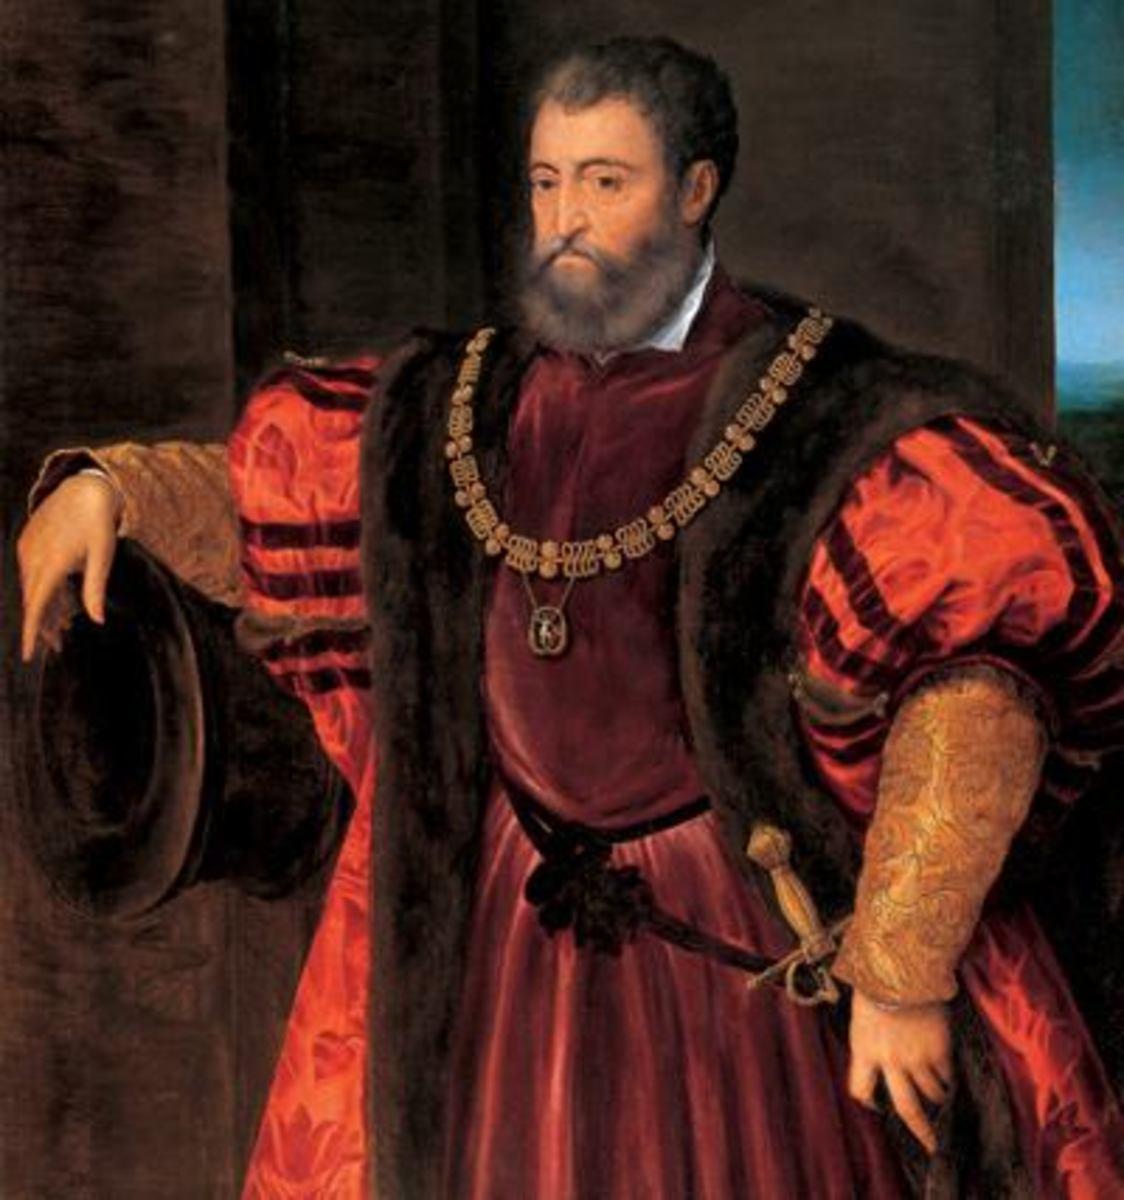 Alfonso I. d'Este, Duke of Ferrara, Old Money rich royalty.